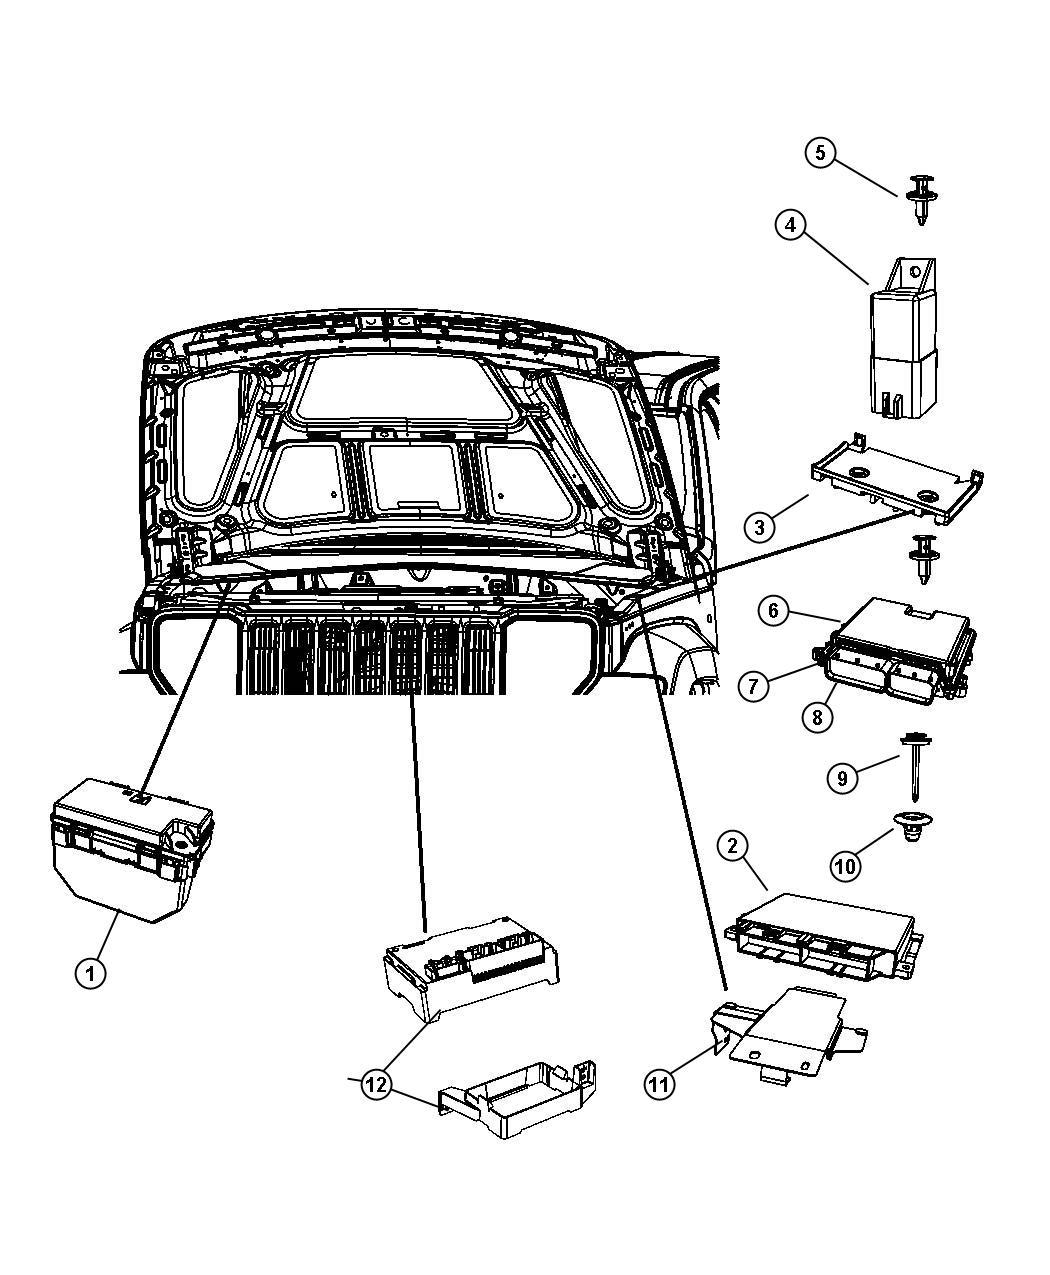 Powertrain Control Module Diagram For 2003 Jeep Liberty Renegade 37